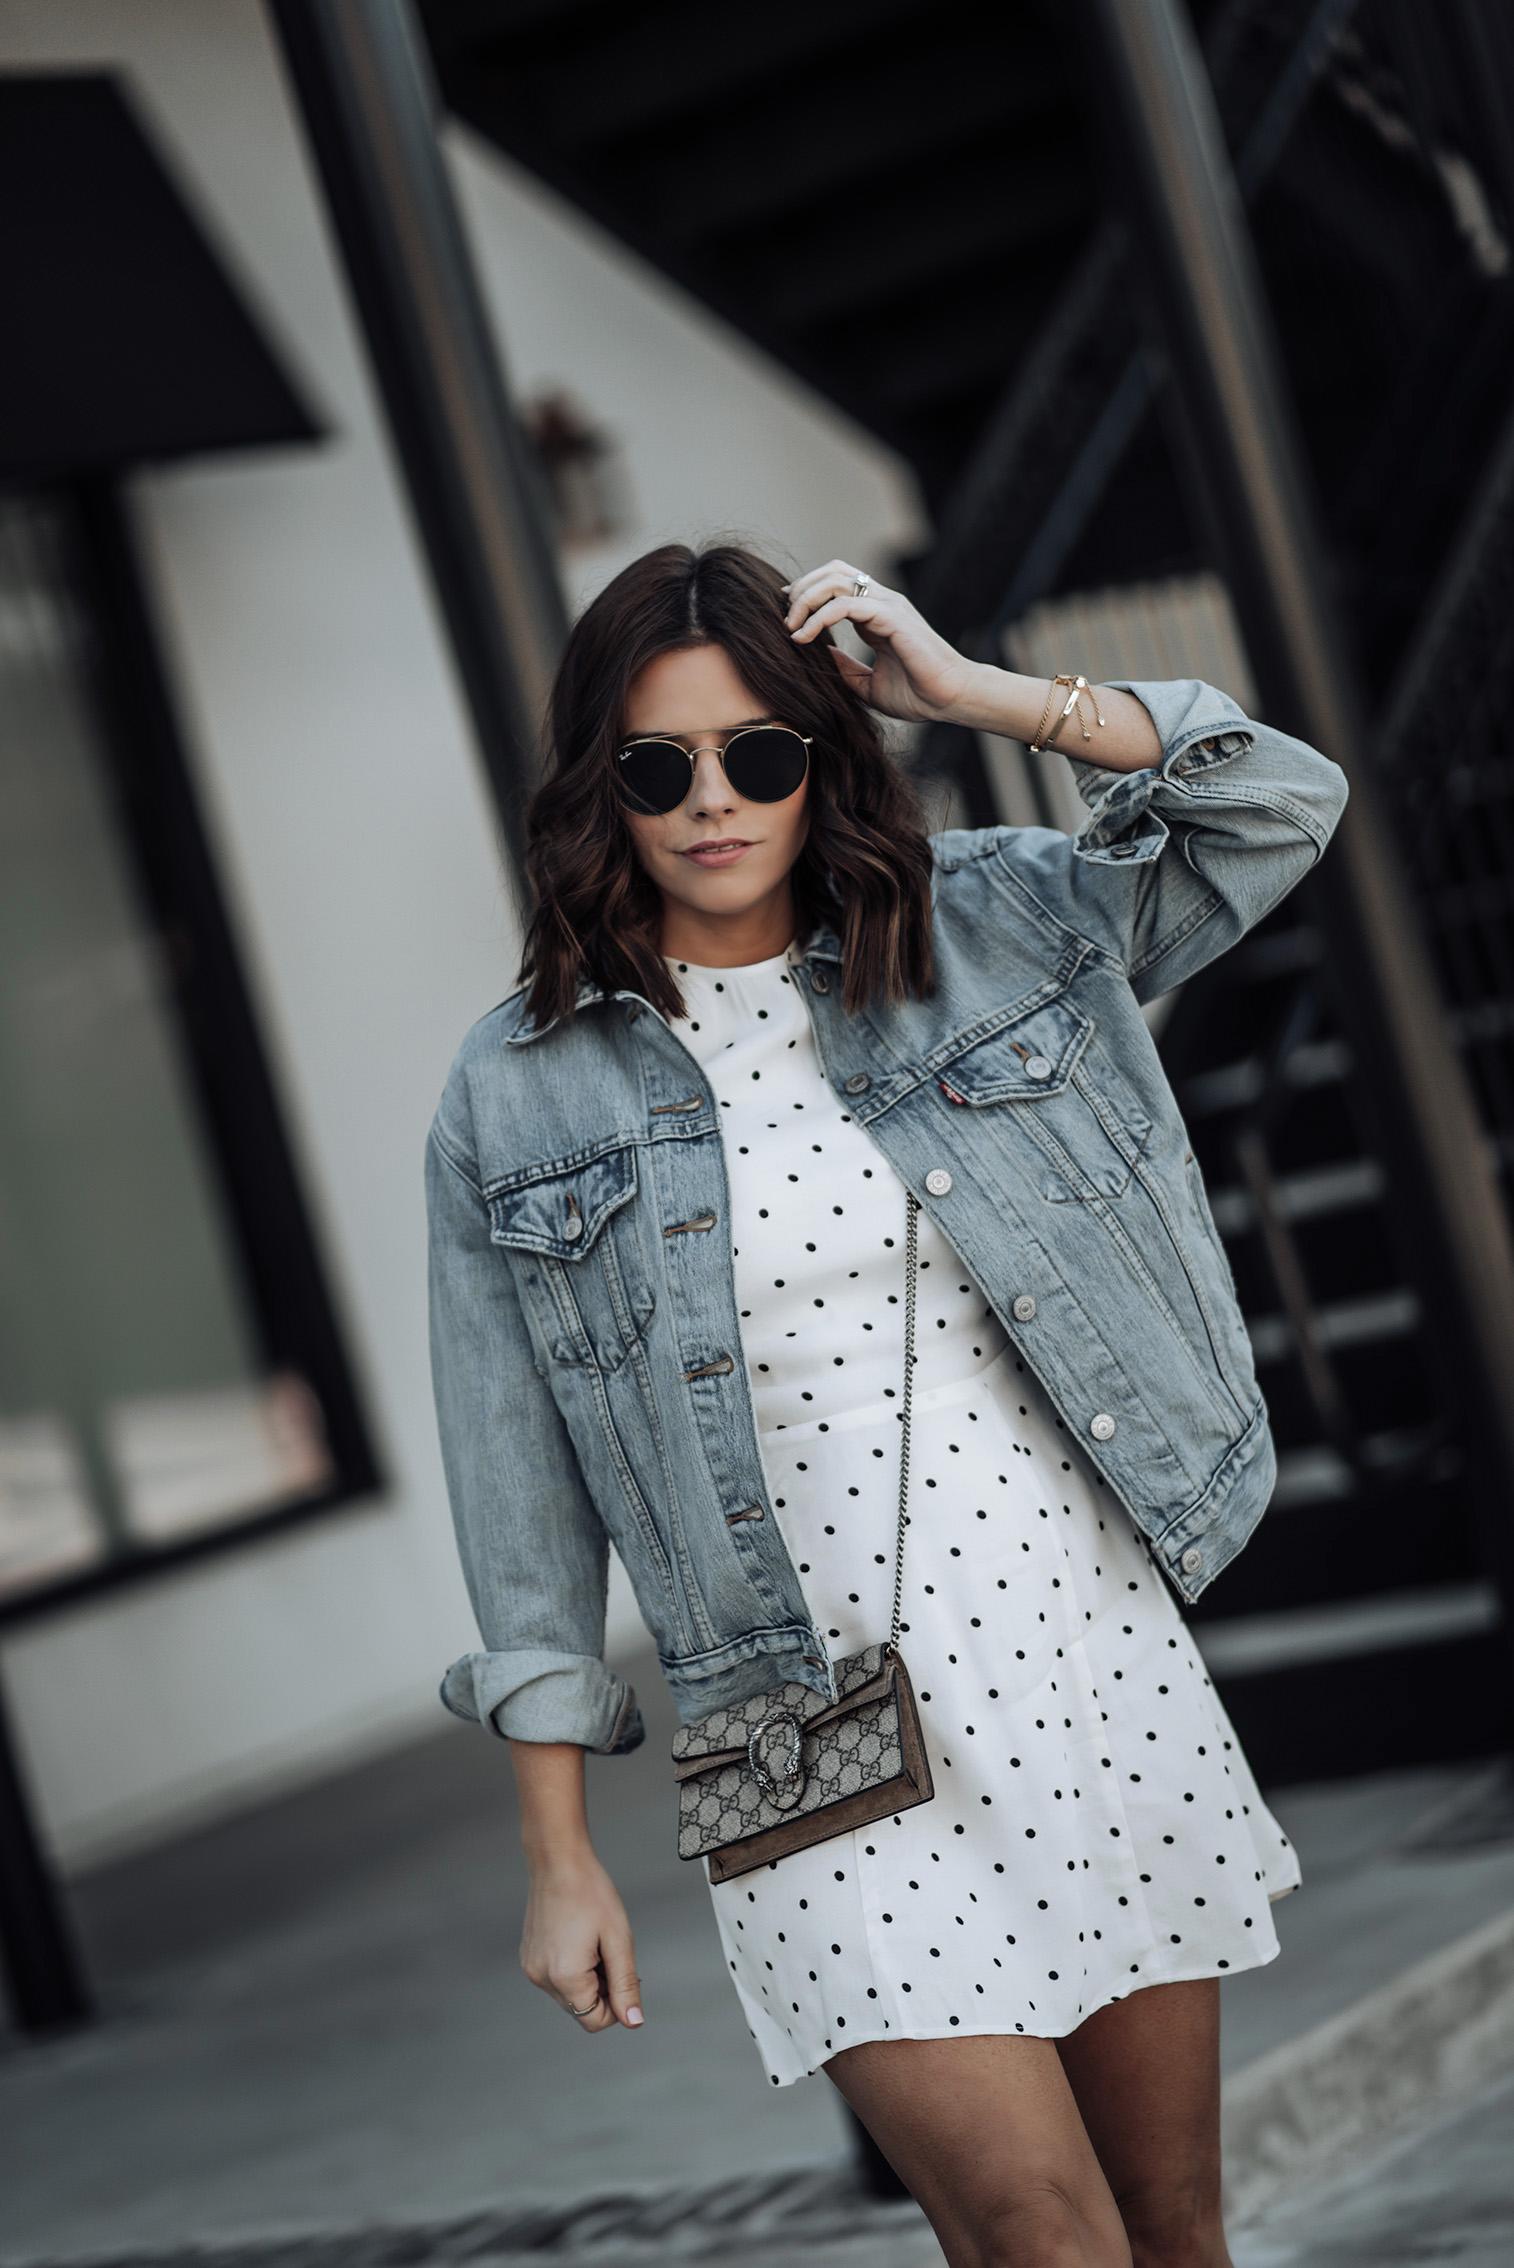 Dot Dress by Reformation | Levi's Ex Boyfriend Denim Jacket | H&M White Ankle Boots | #liketkit #polkadot #streetstyle